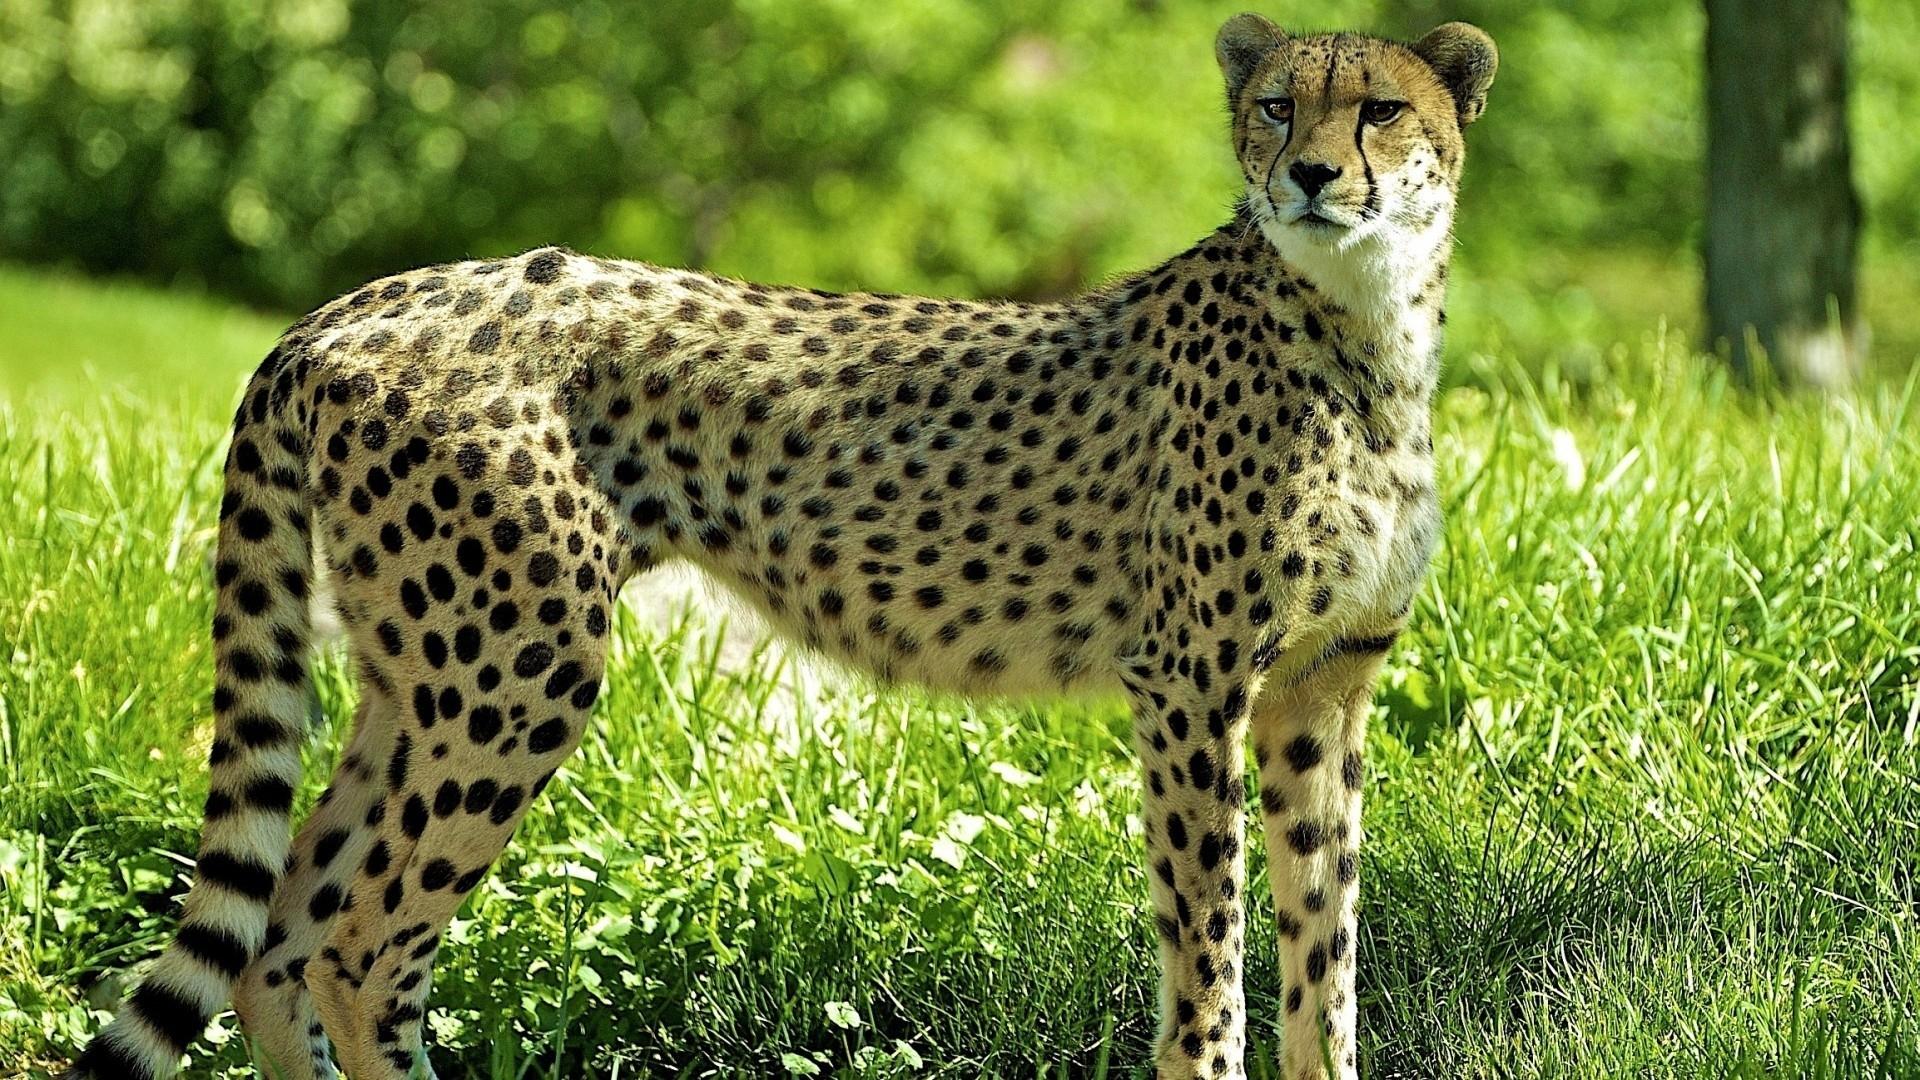 образцы гепард кошки картинки поговорим наиболее